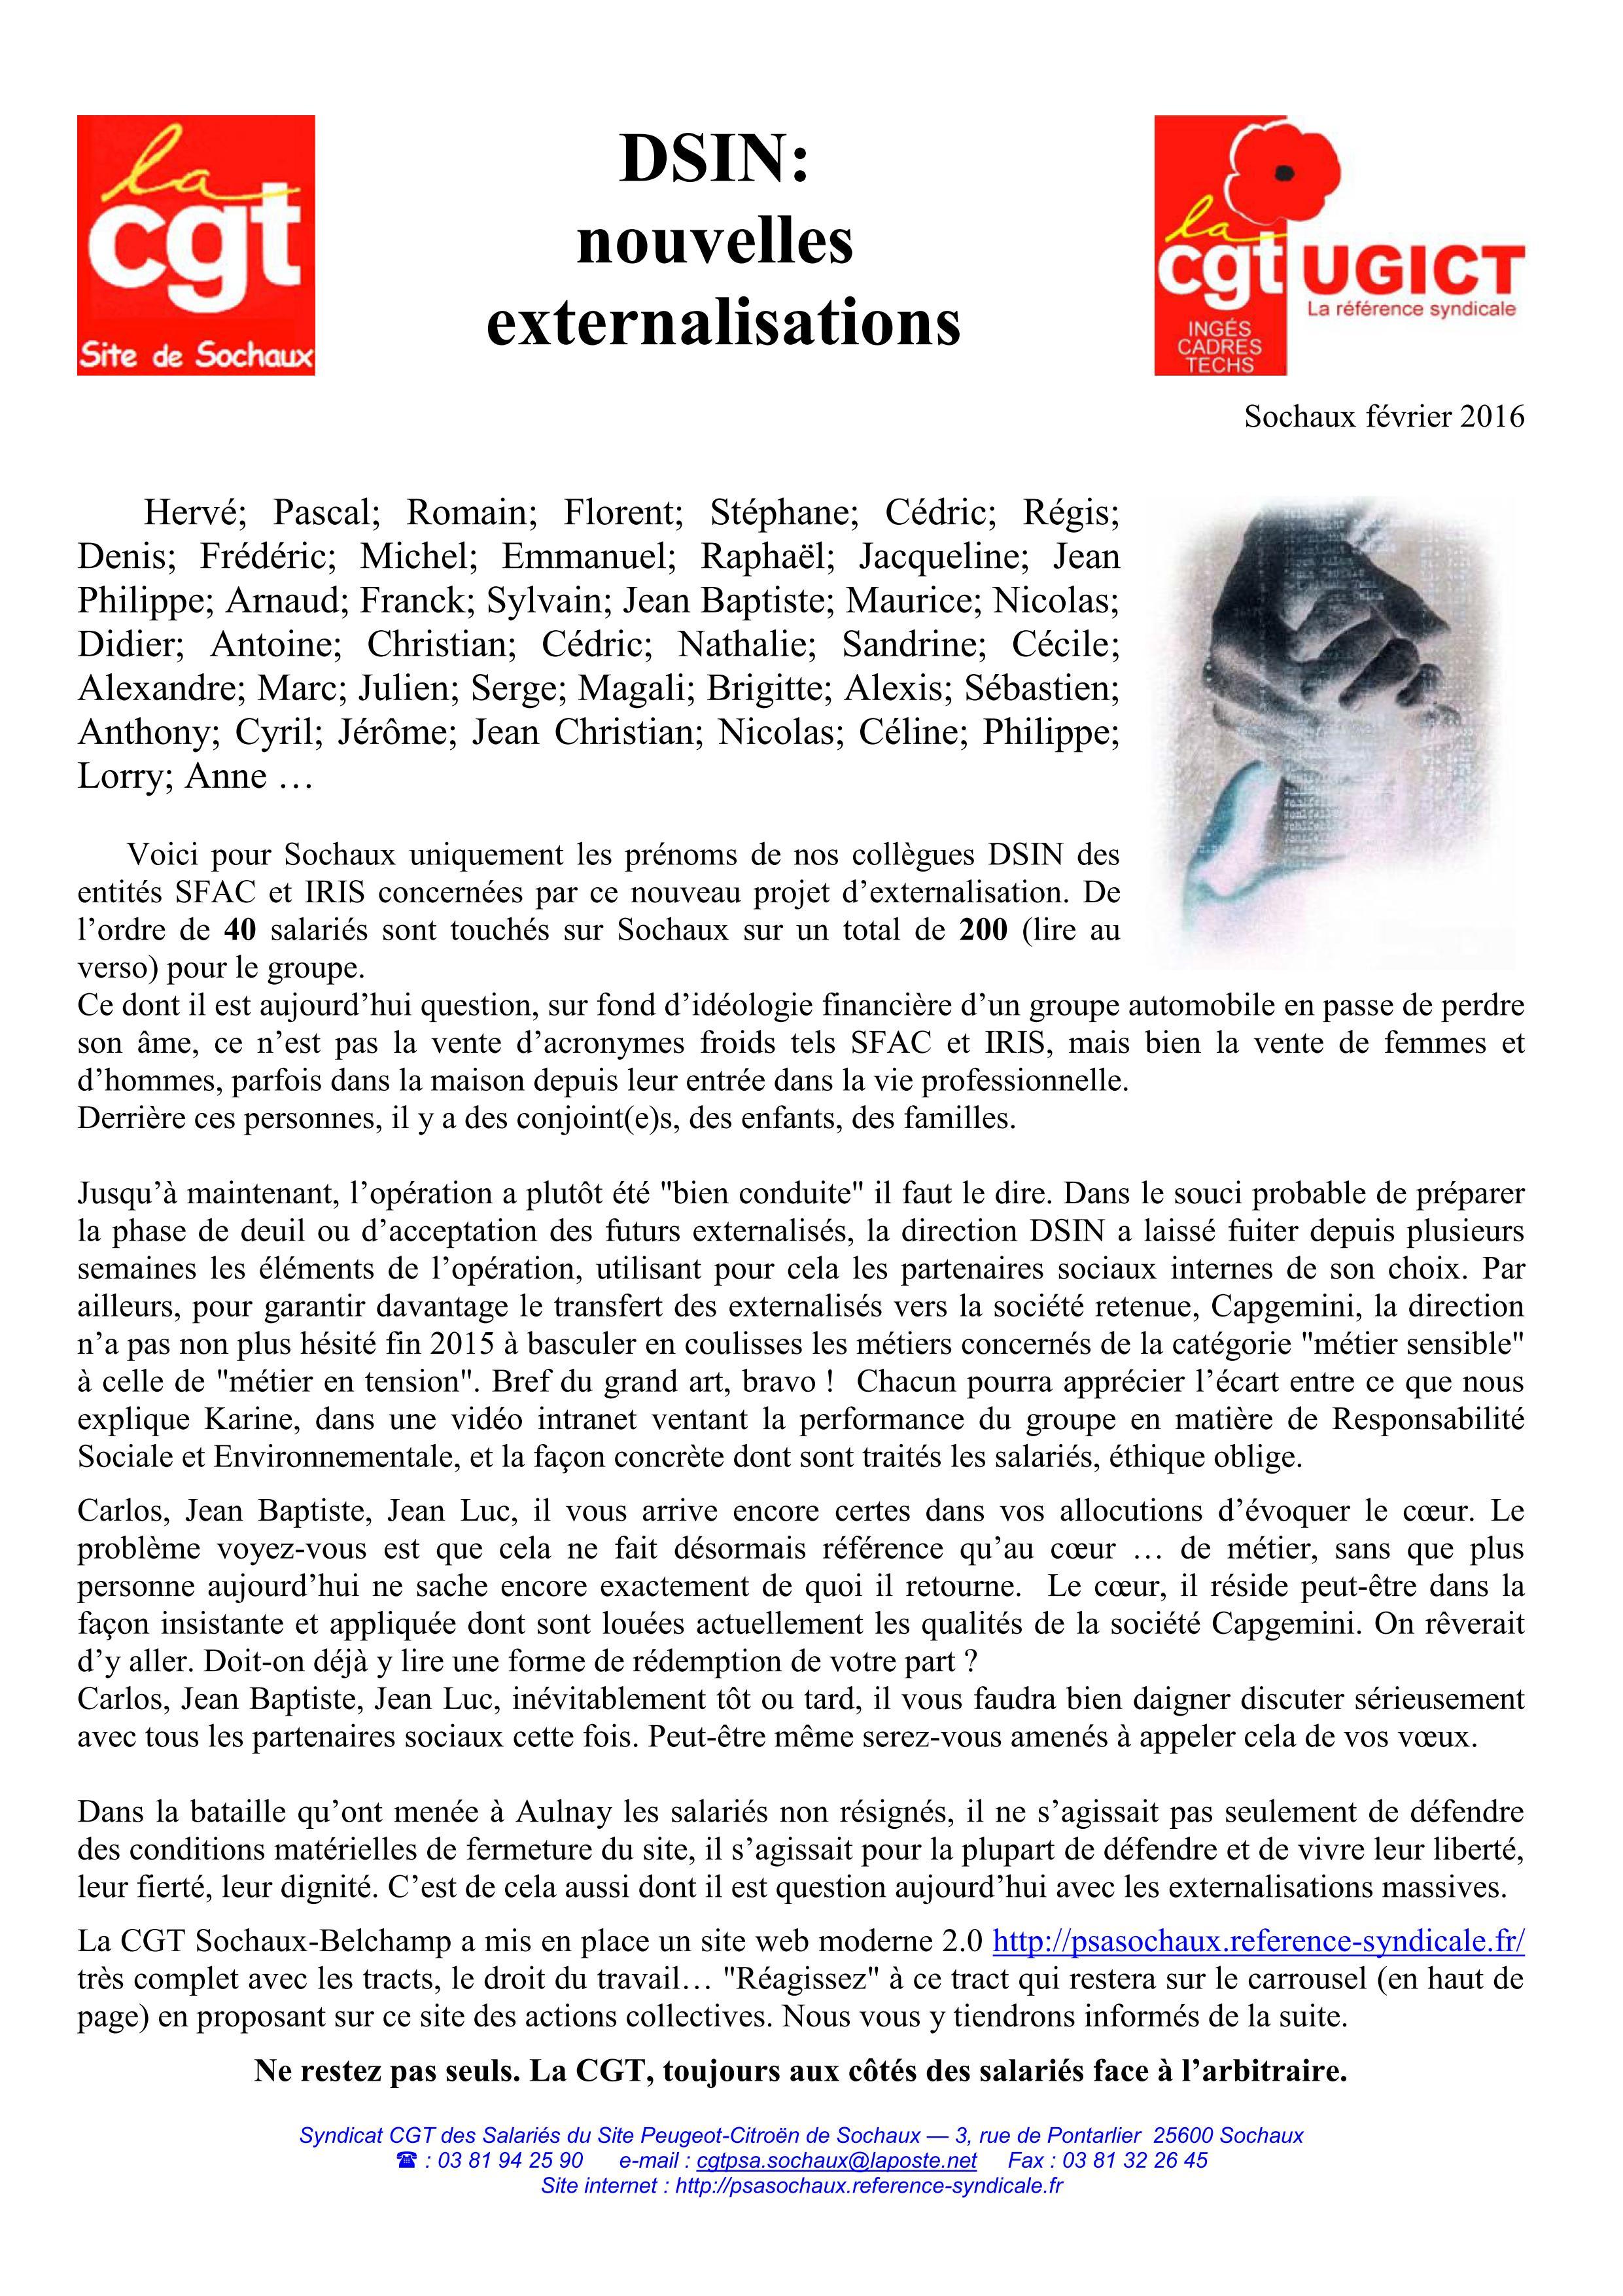 PSA 2016 S05 extenalisations DSIN_01